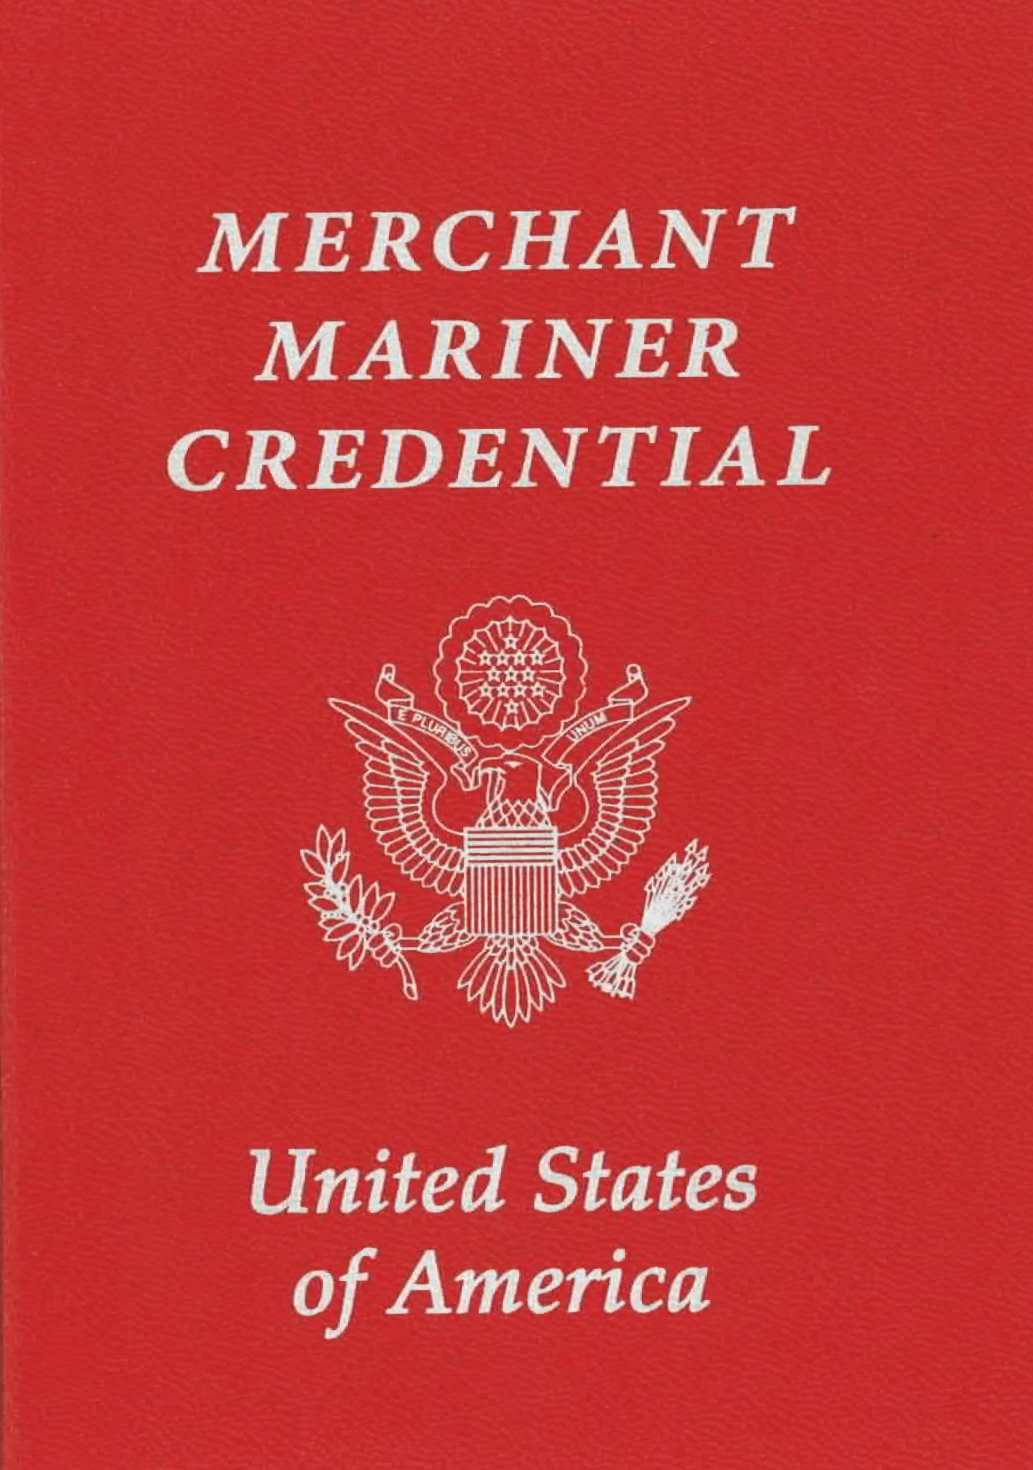 Merchant Mariner Credential - Wikipedia